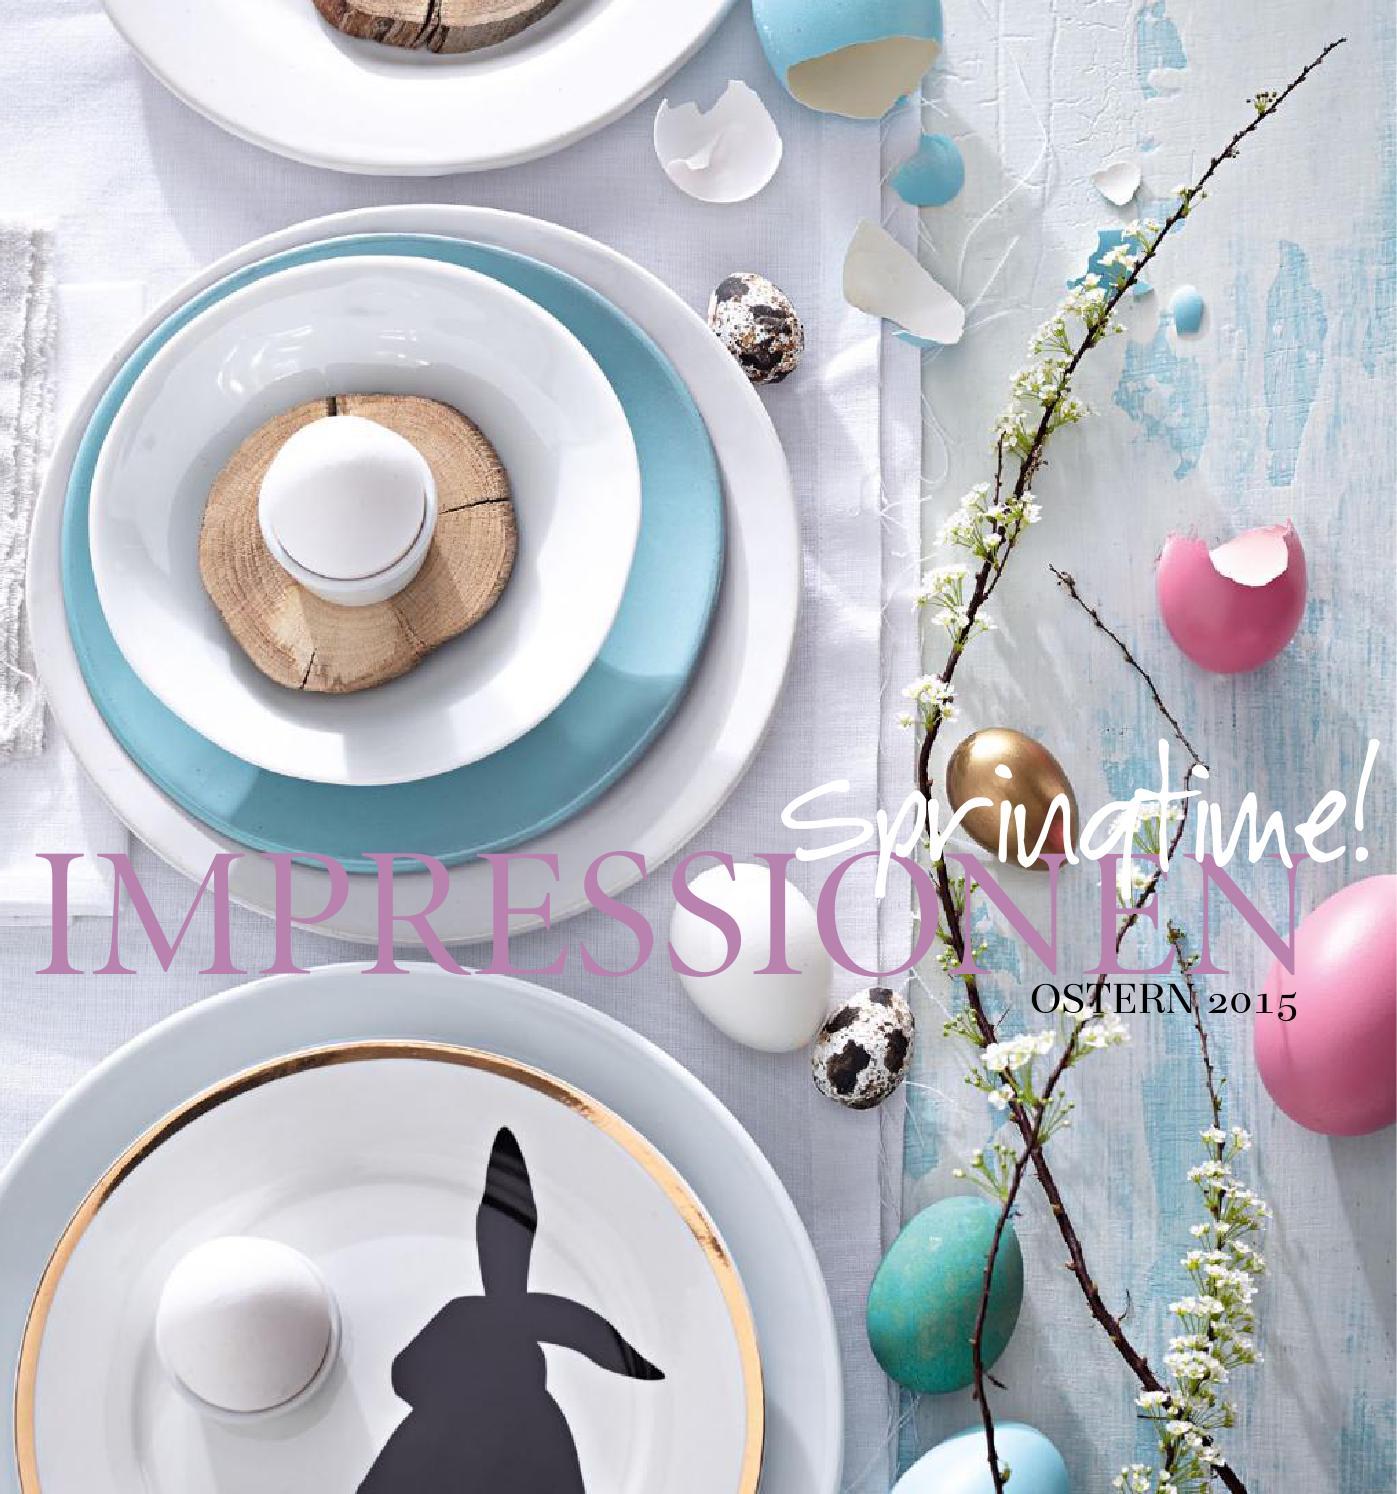 Laterne Rostoptik Luxus КатаРог Impressionen весна 2015 Заказ одежды на